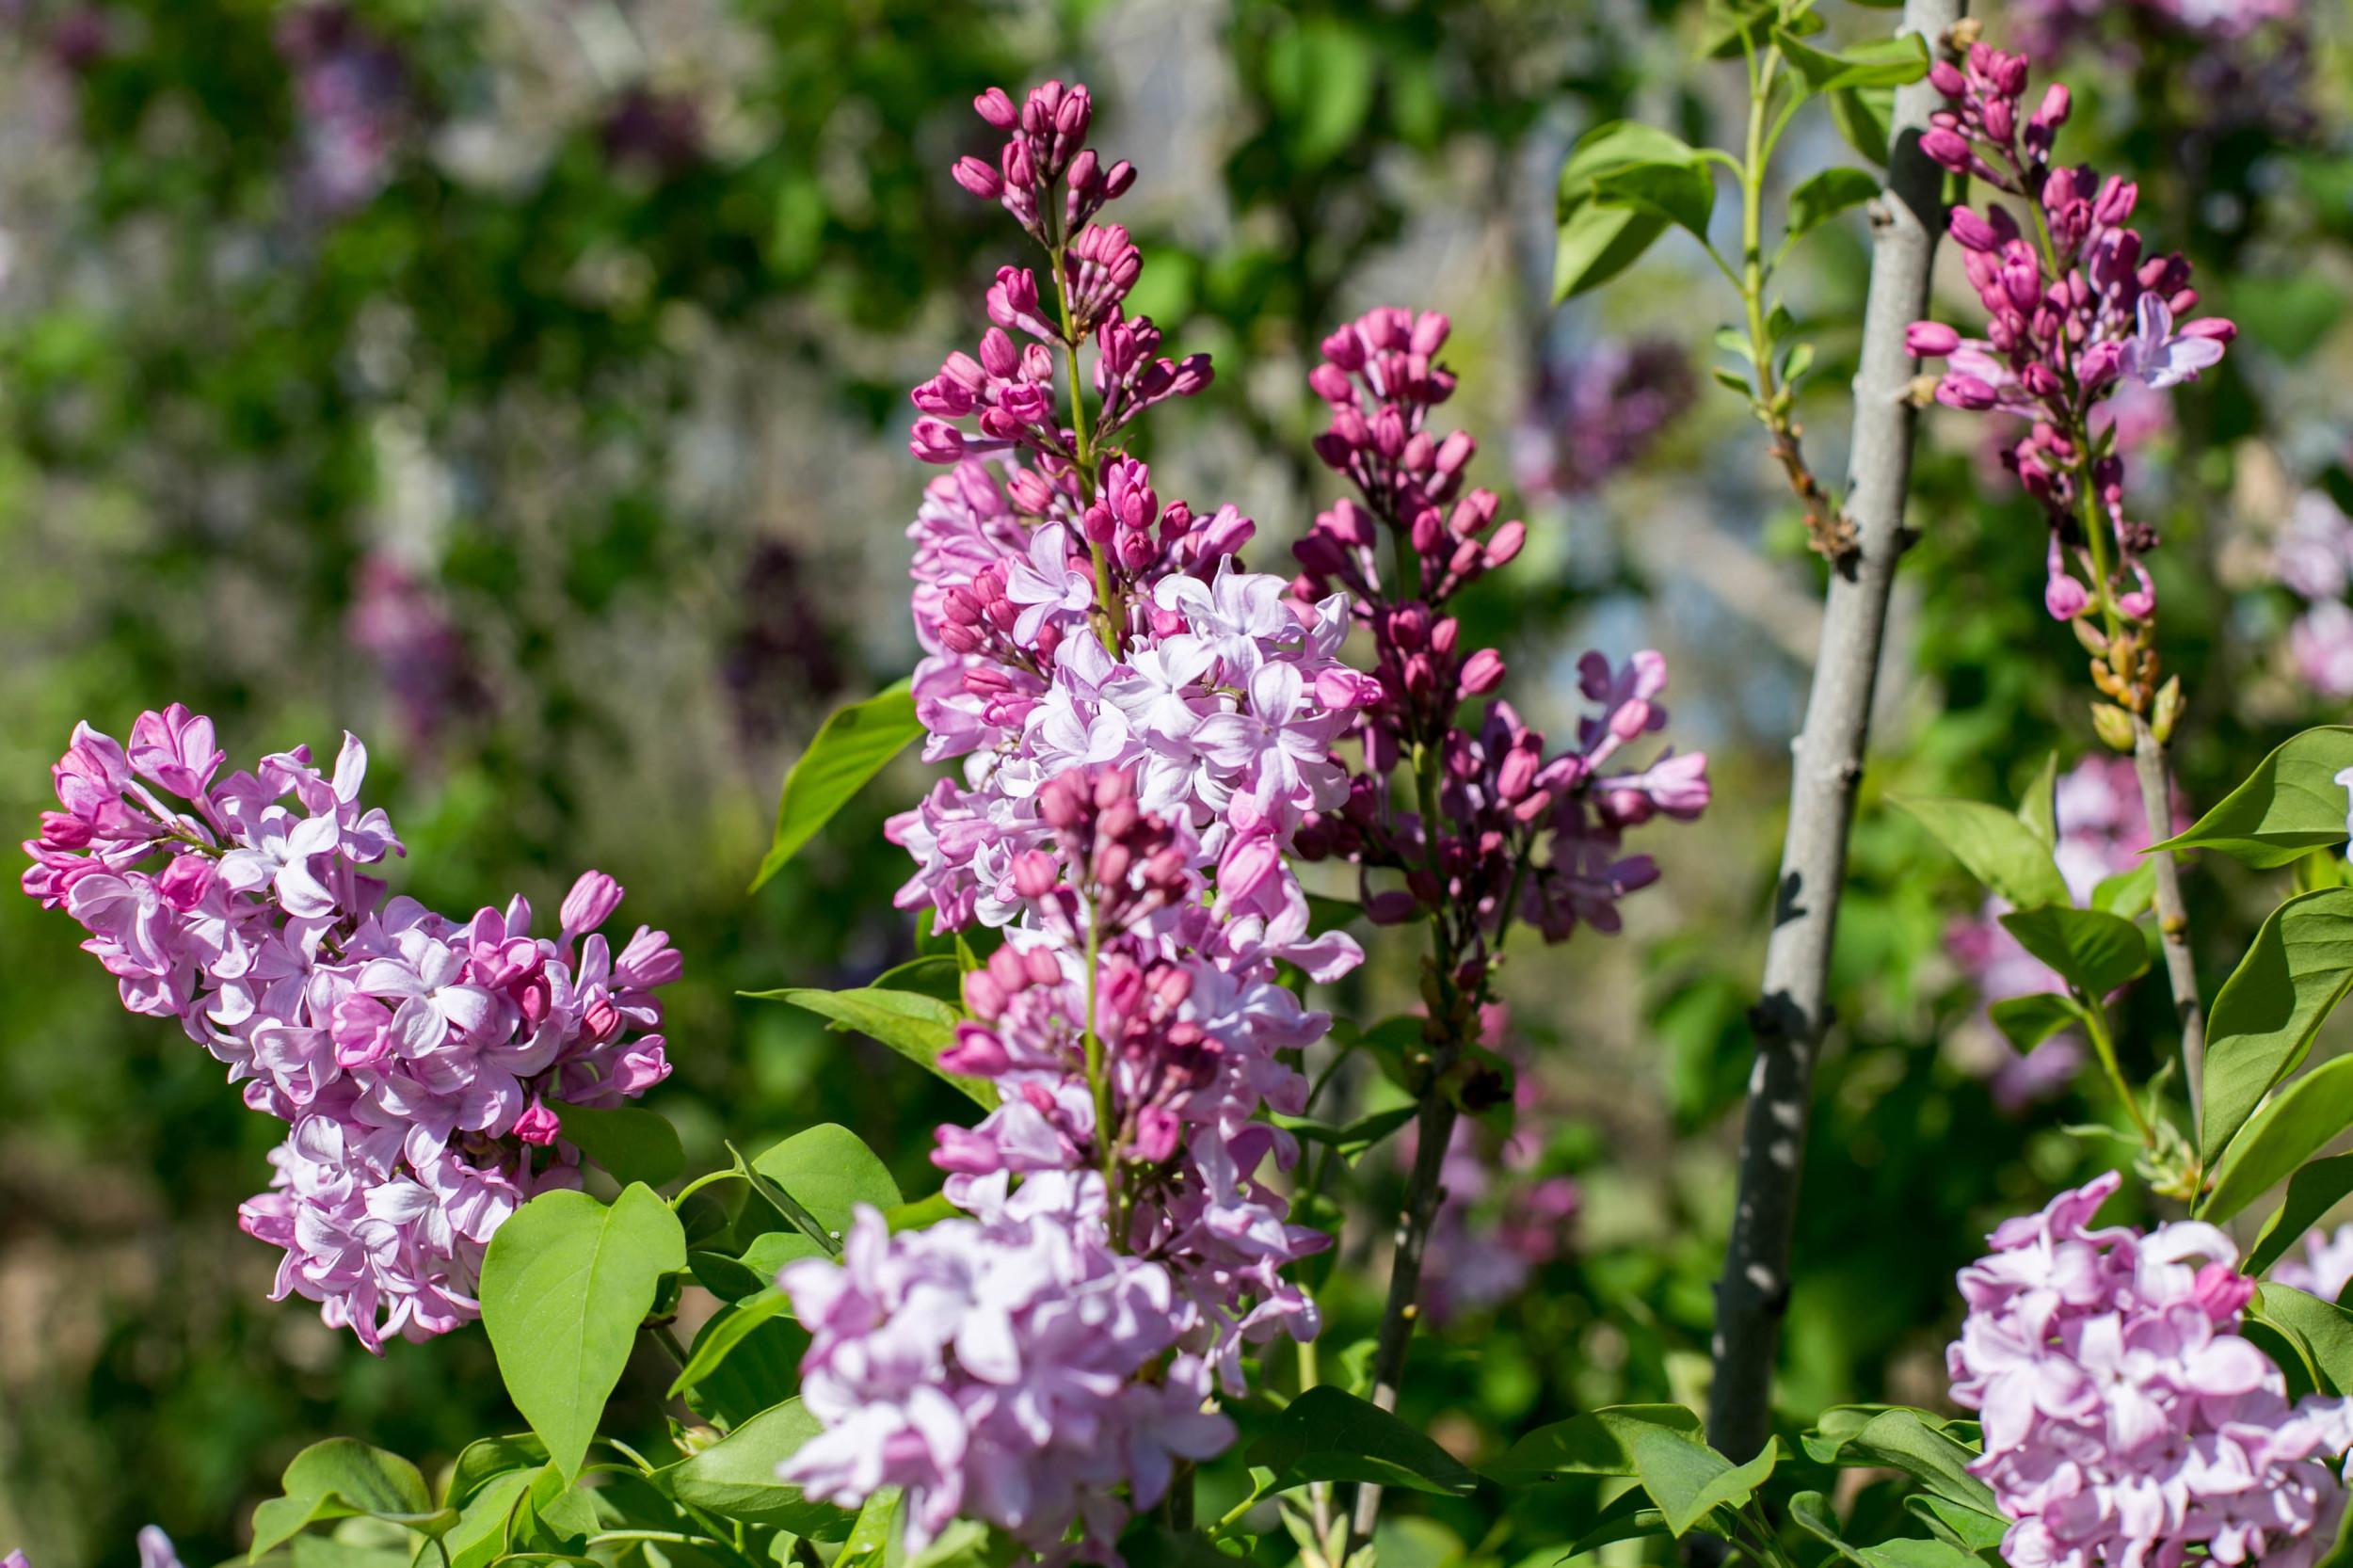 'California Rose' Lilac